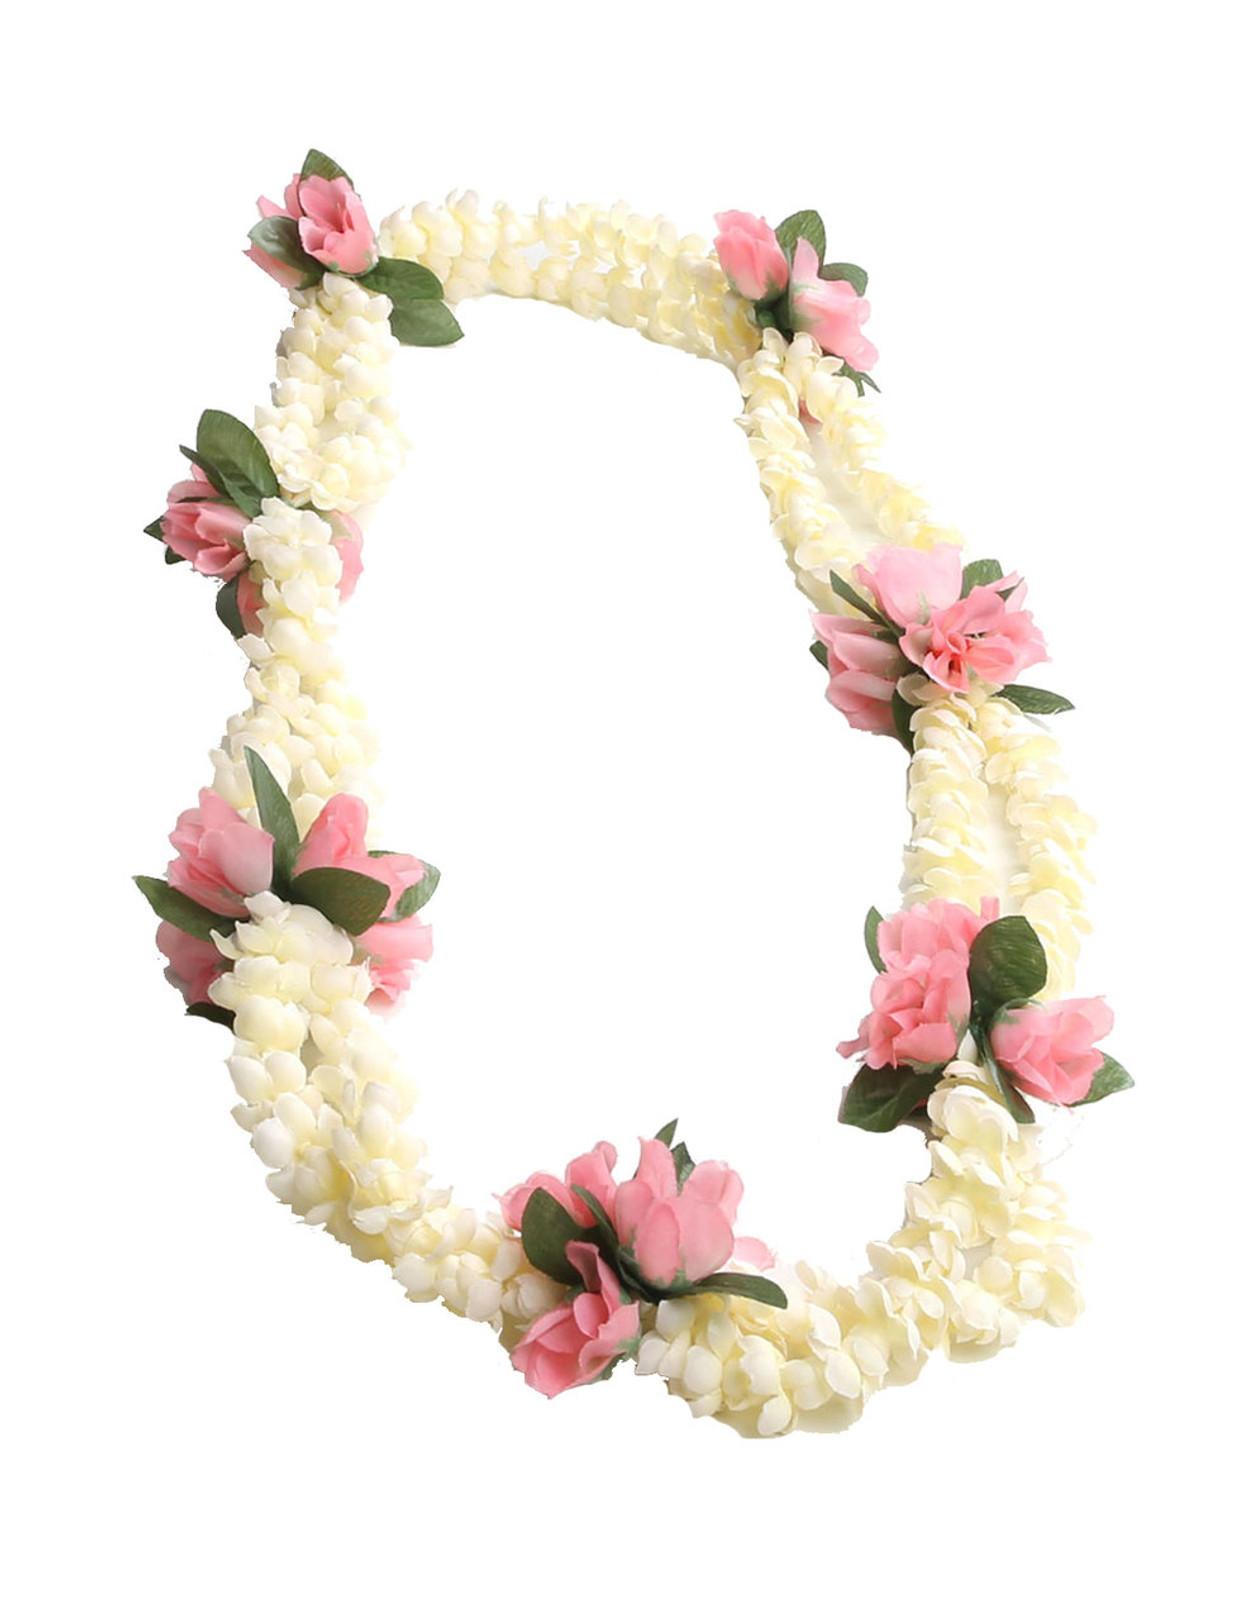 Double Pikake Rope And Pink Rosebuds Silk Lei Hawaiian Wedding Place